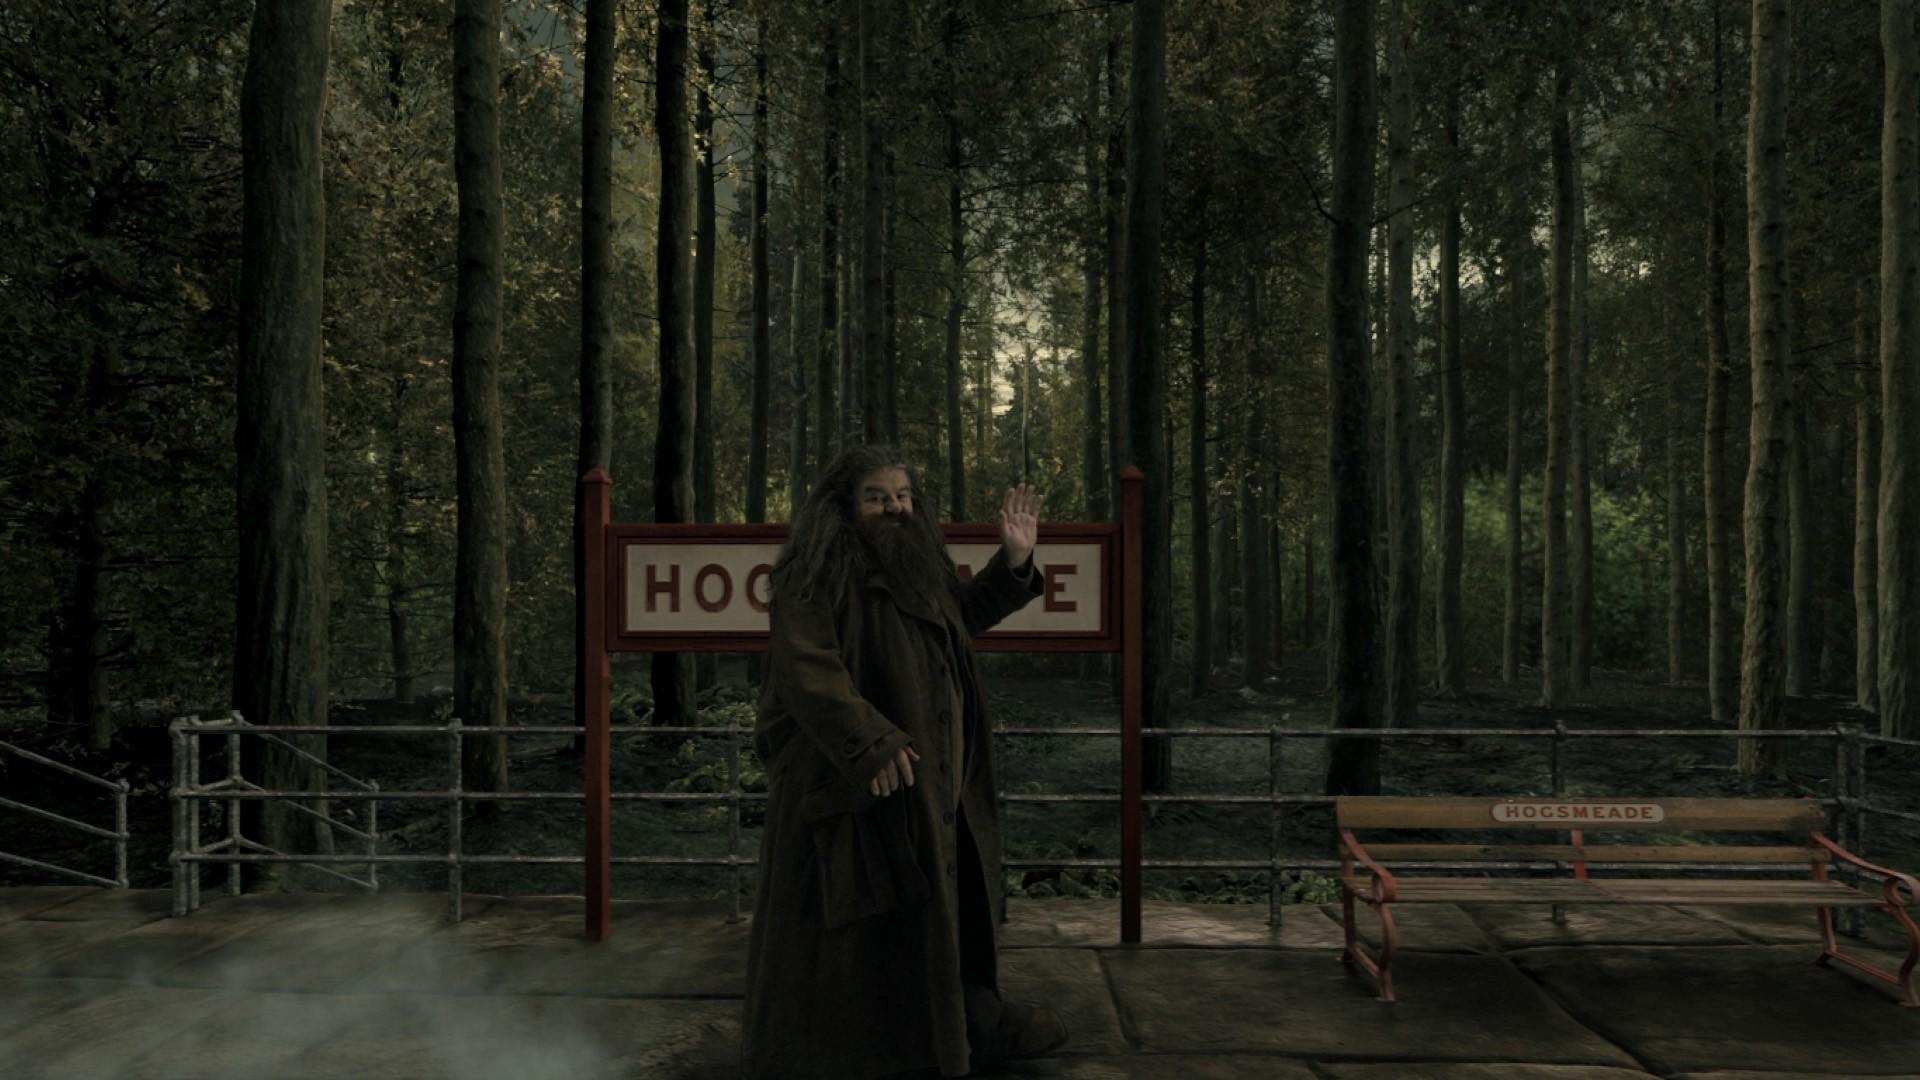 InSanity lurks Inside: A Closer Look at The Hogwarts Express at .